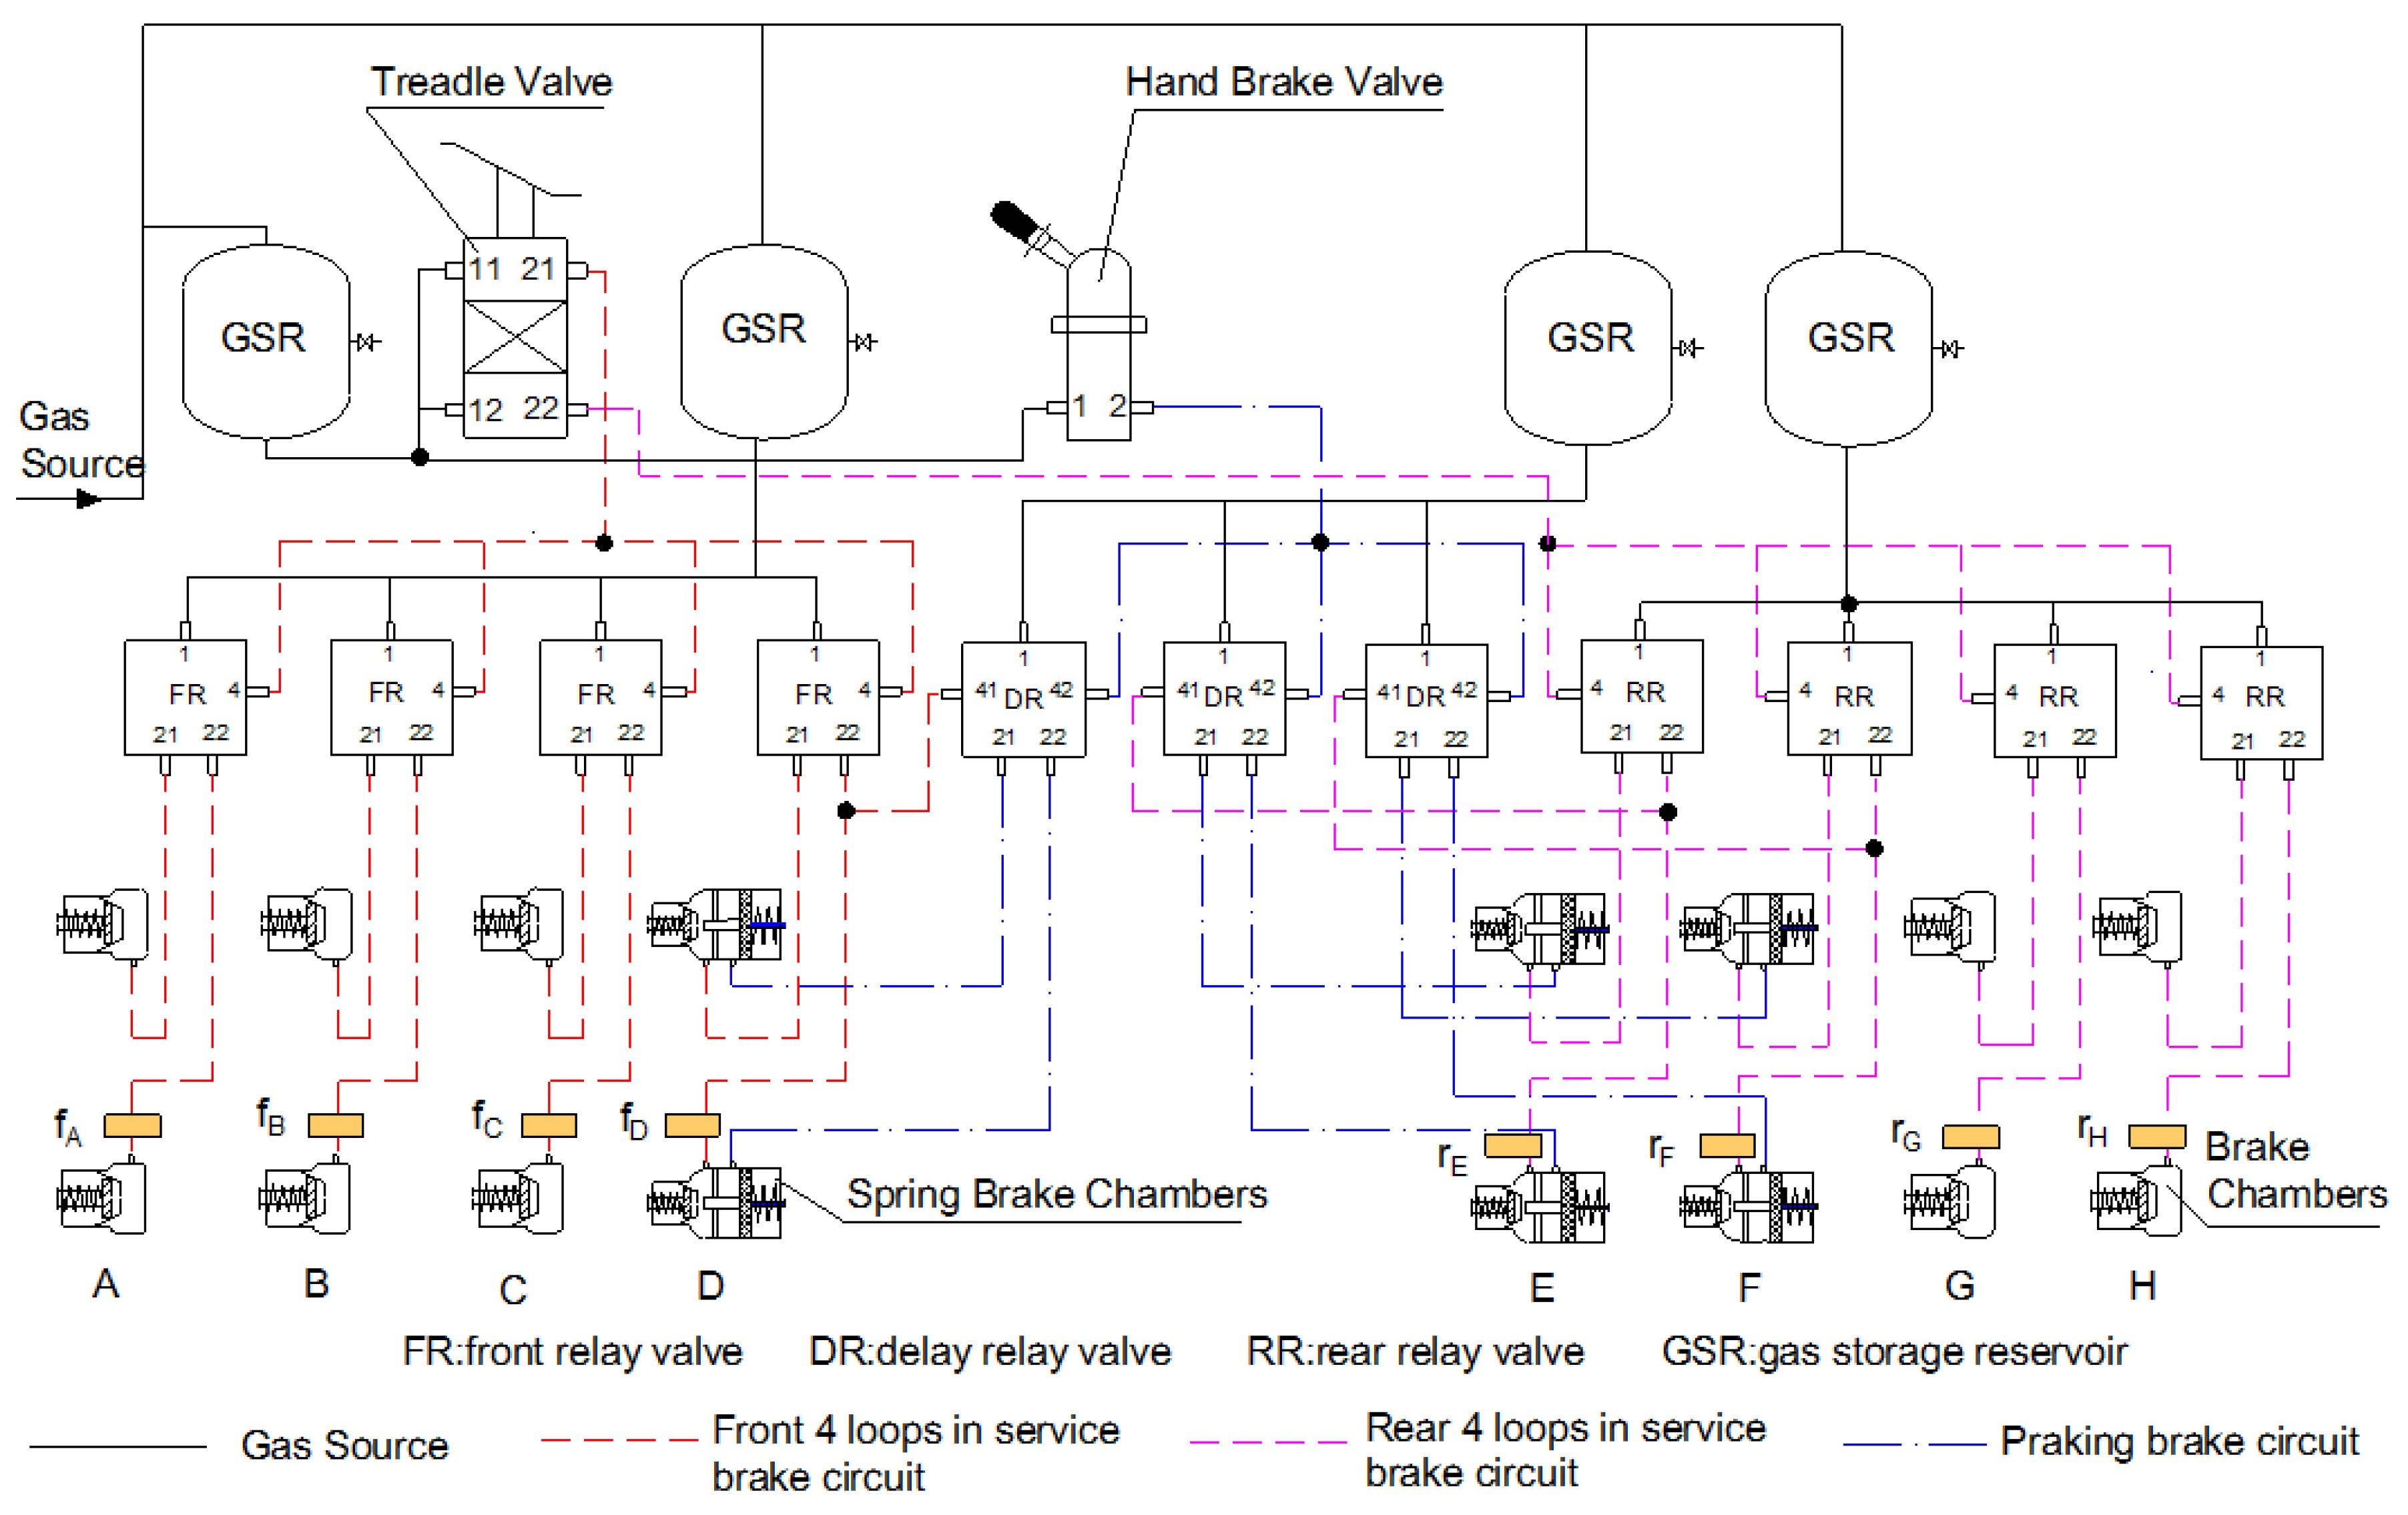 Air Brake Foot Valve Diagram Applied Sciences Free Full Text Of Air Brake Foot Valve Diagram